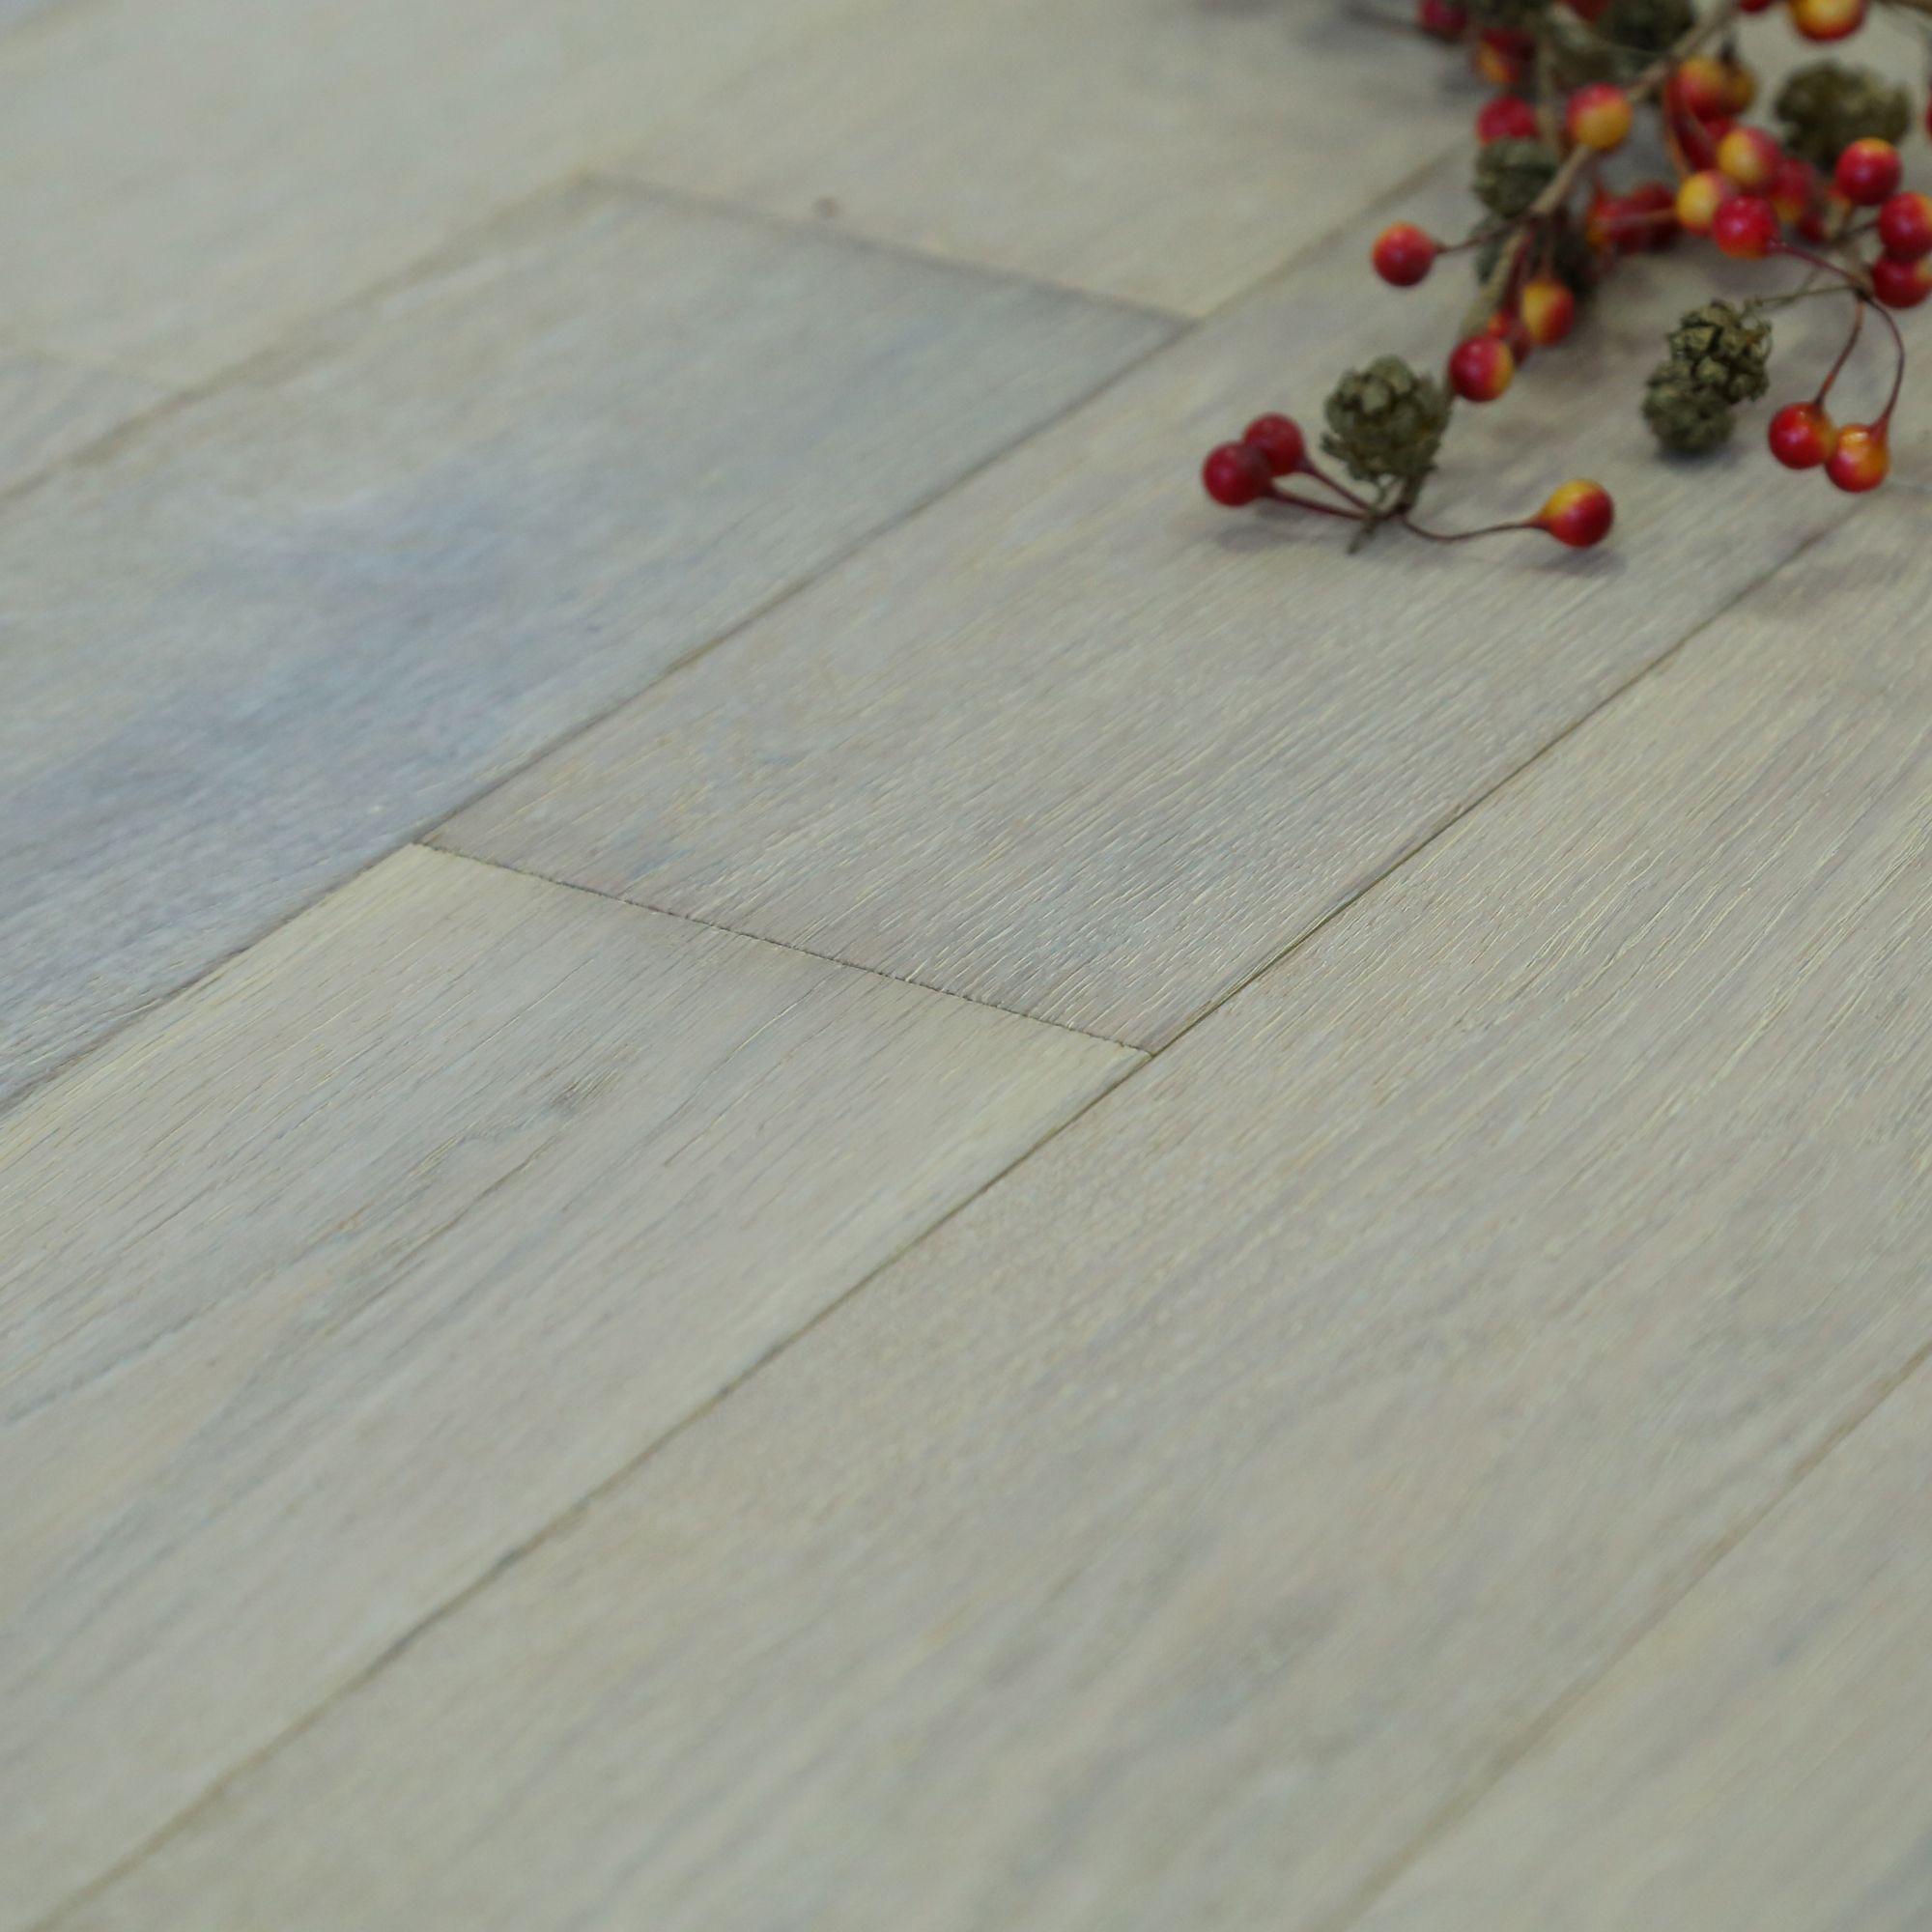 character hardwood products natural exposedoak loft exposed urban similar lauzon urbanloft designer flooring oak floors white